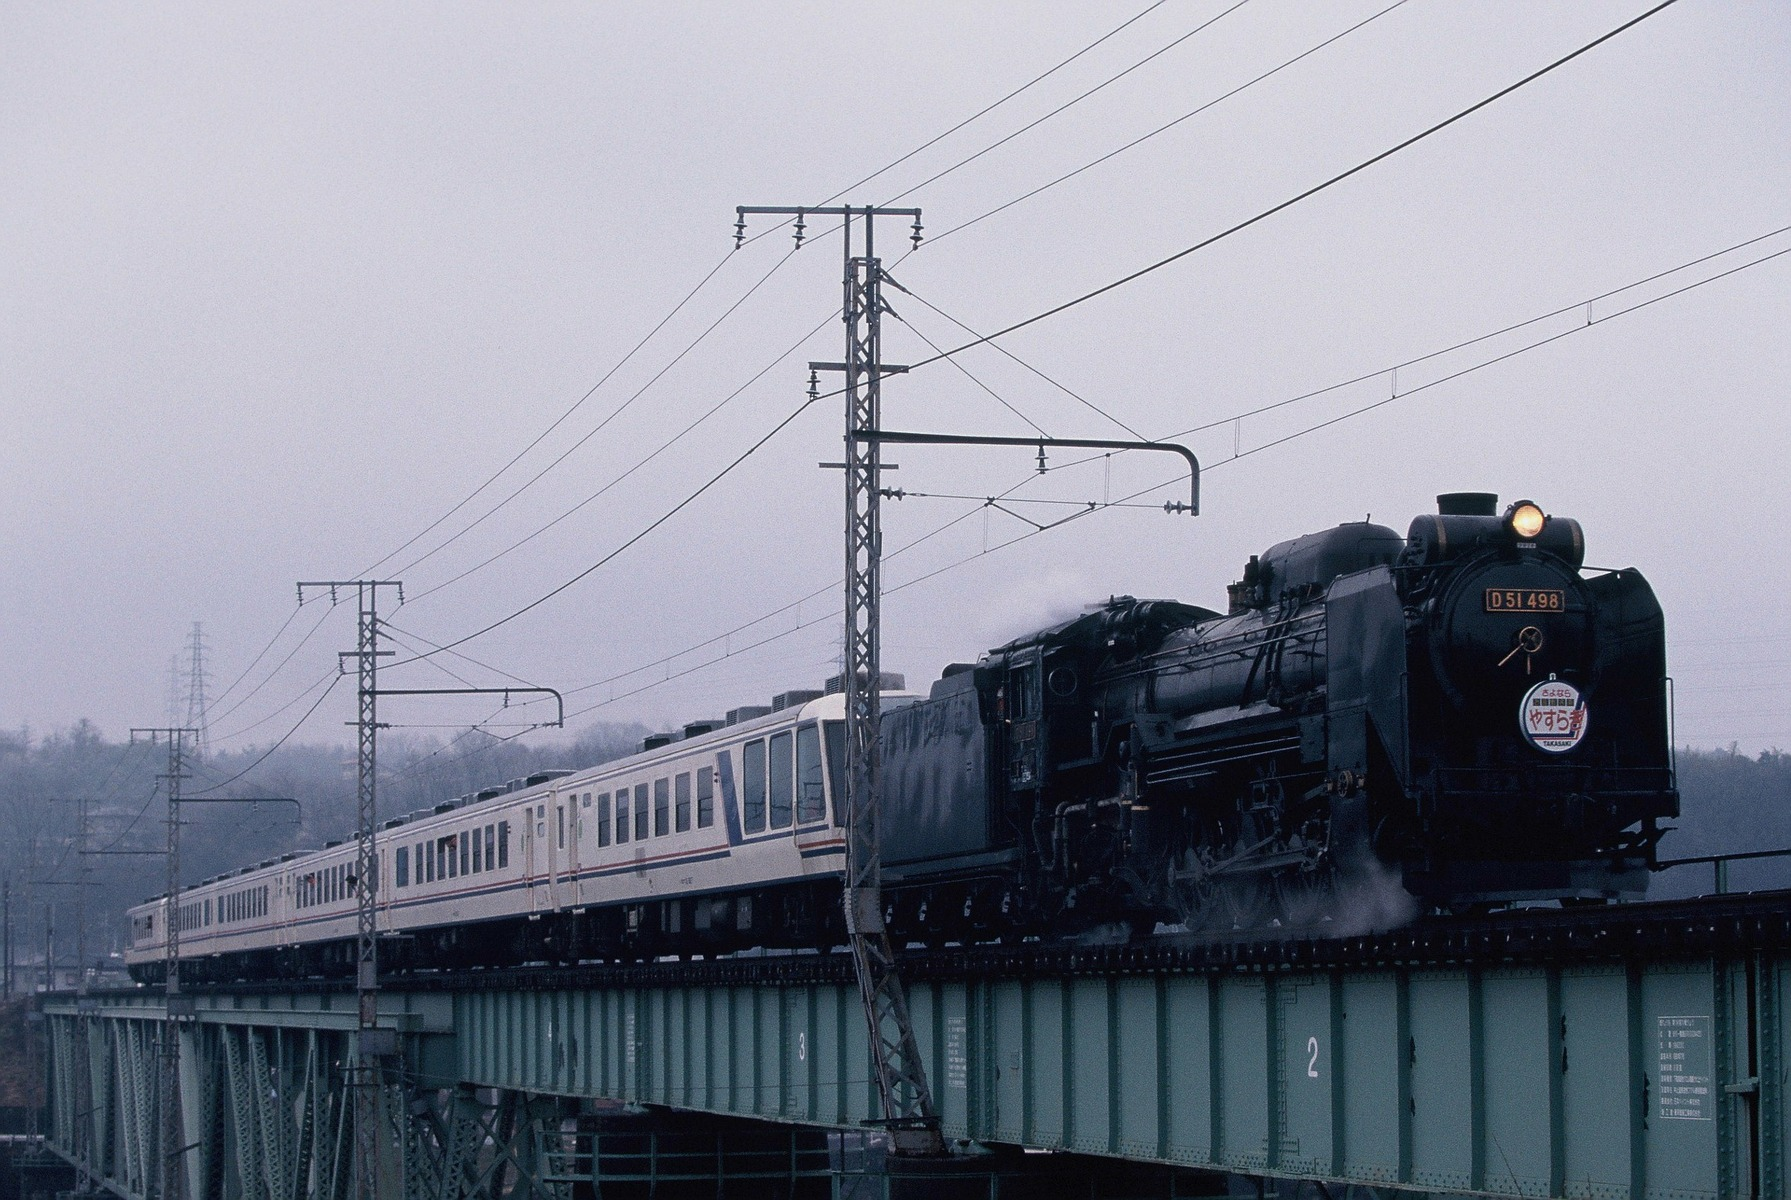 044-019